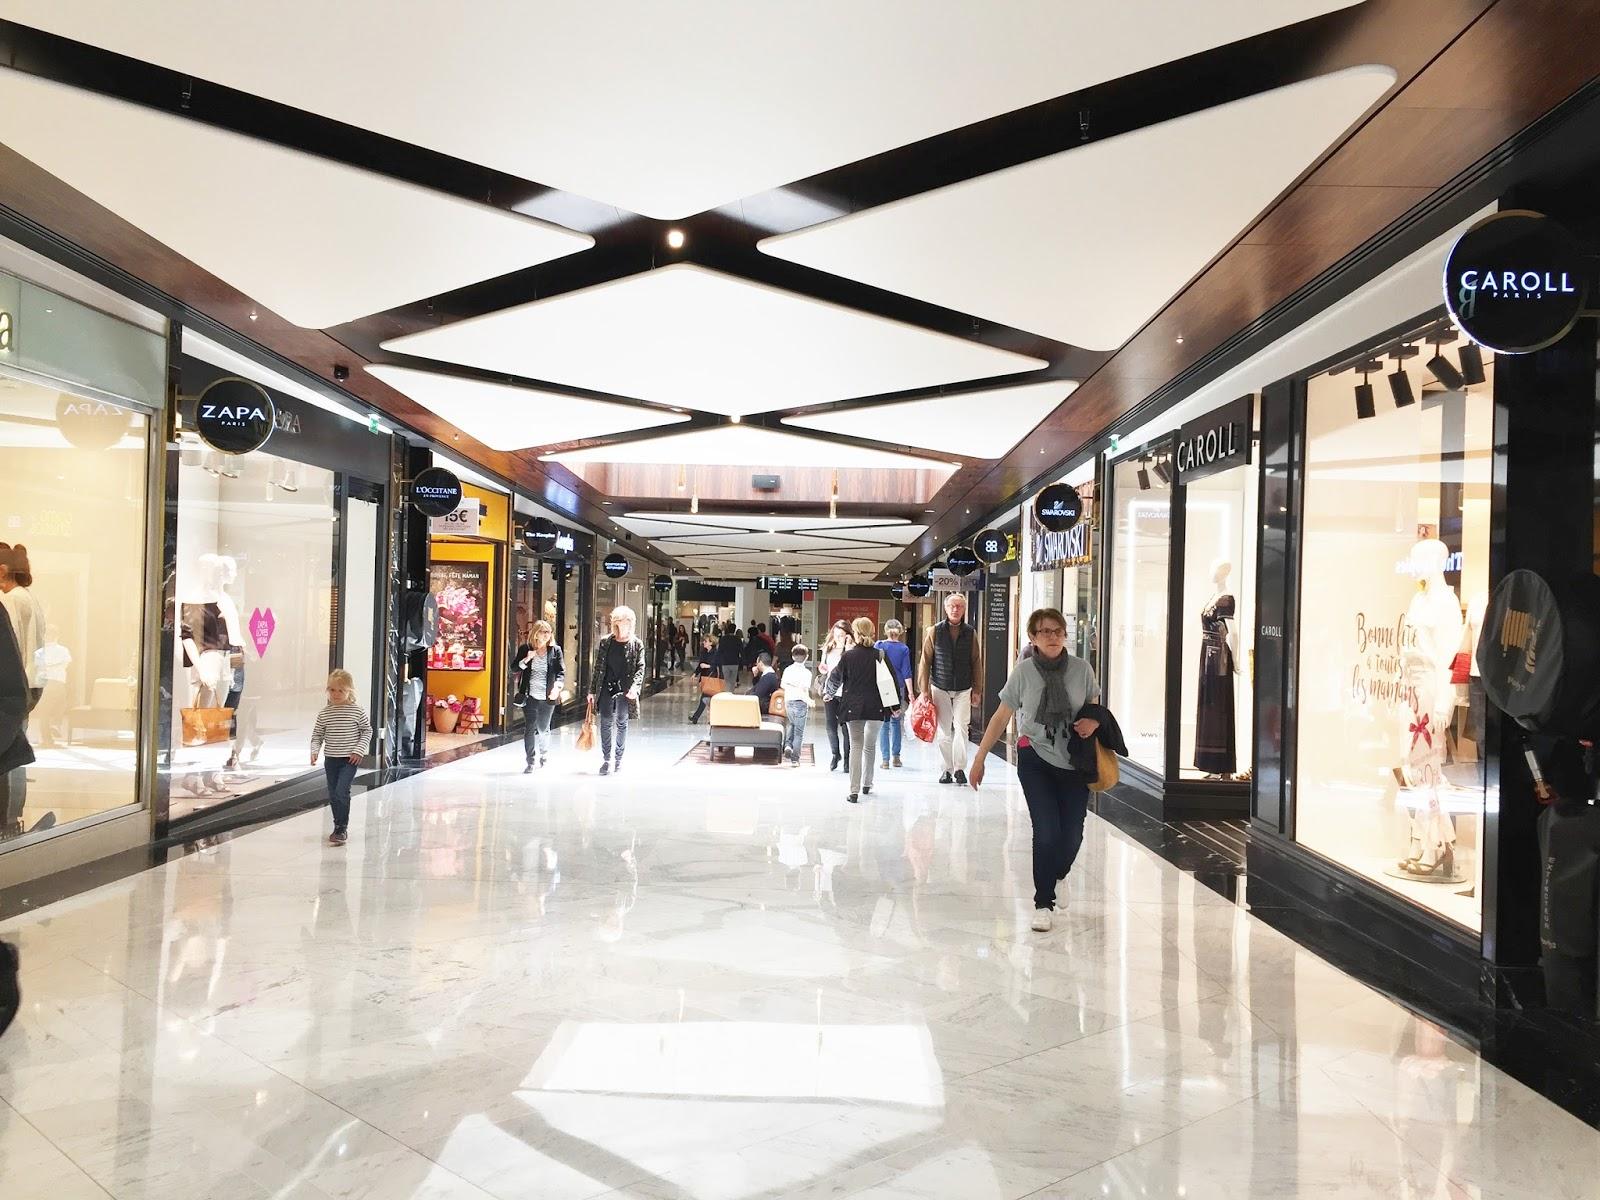 shopping centre commercial parly 2 le chesnay versailles ambassadeurParly2 ambassadrice achat magasin 78 yvelines caroll zapa l'occitane